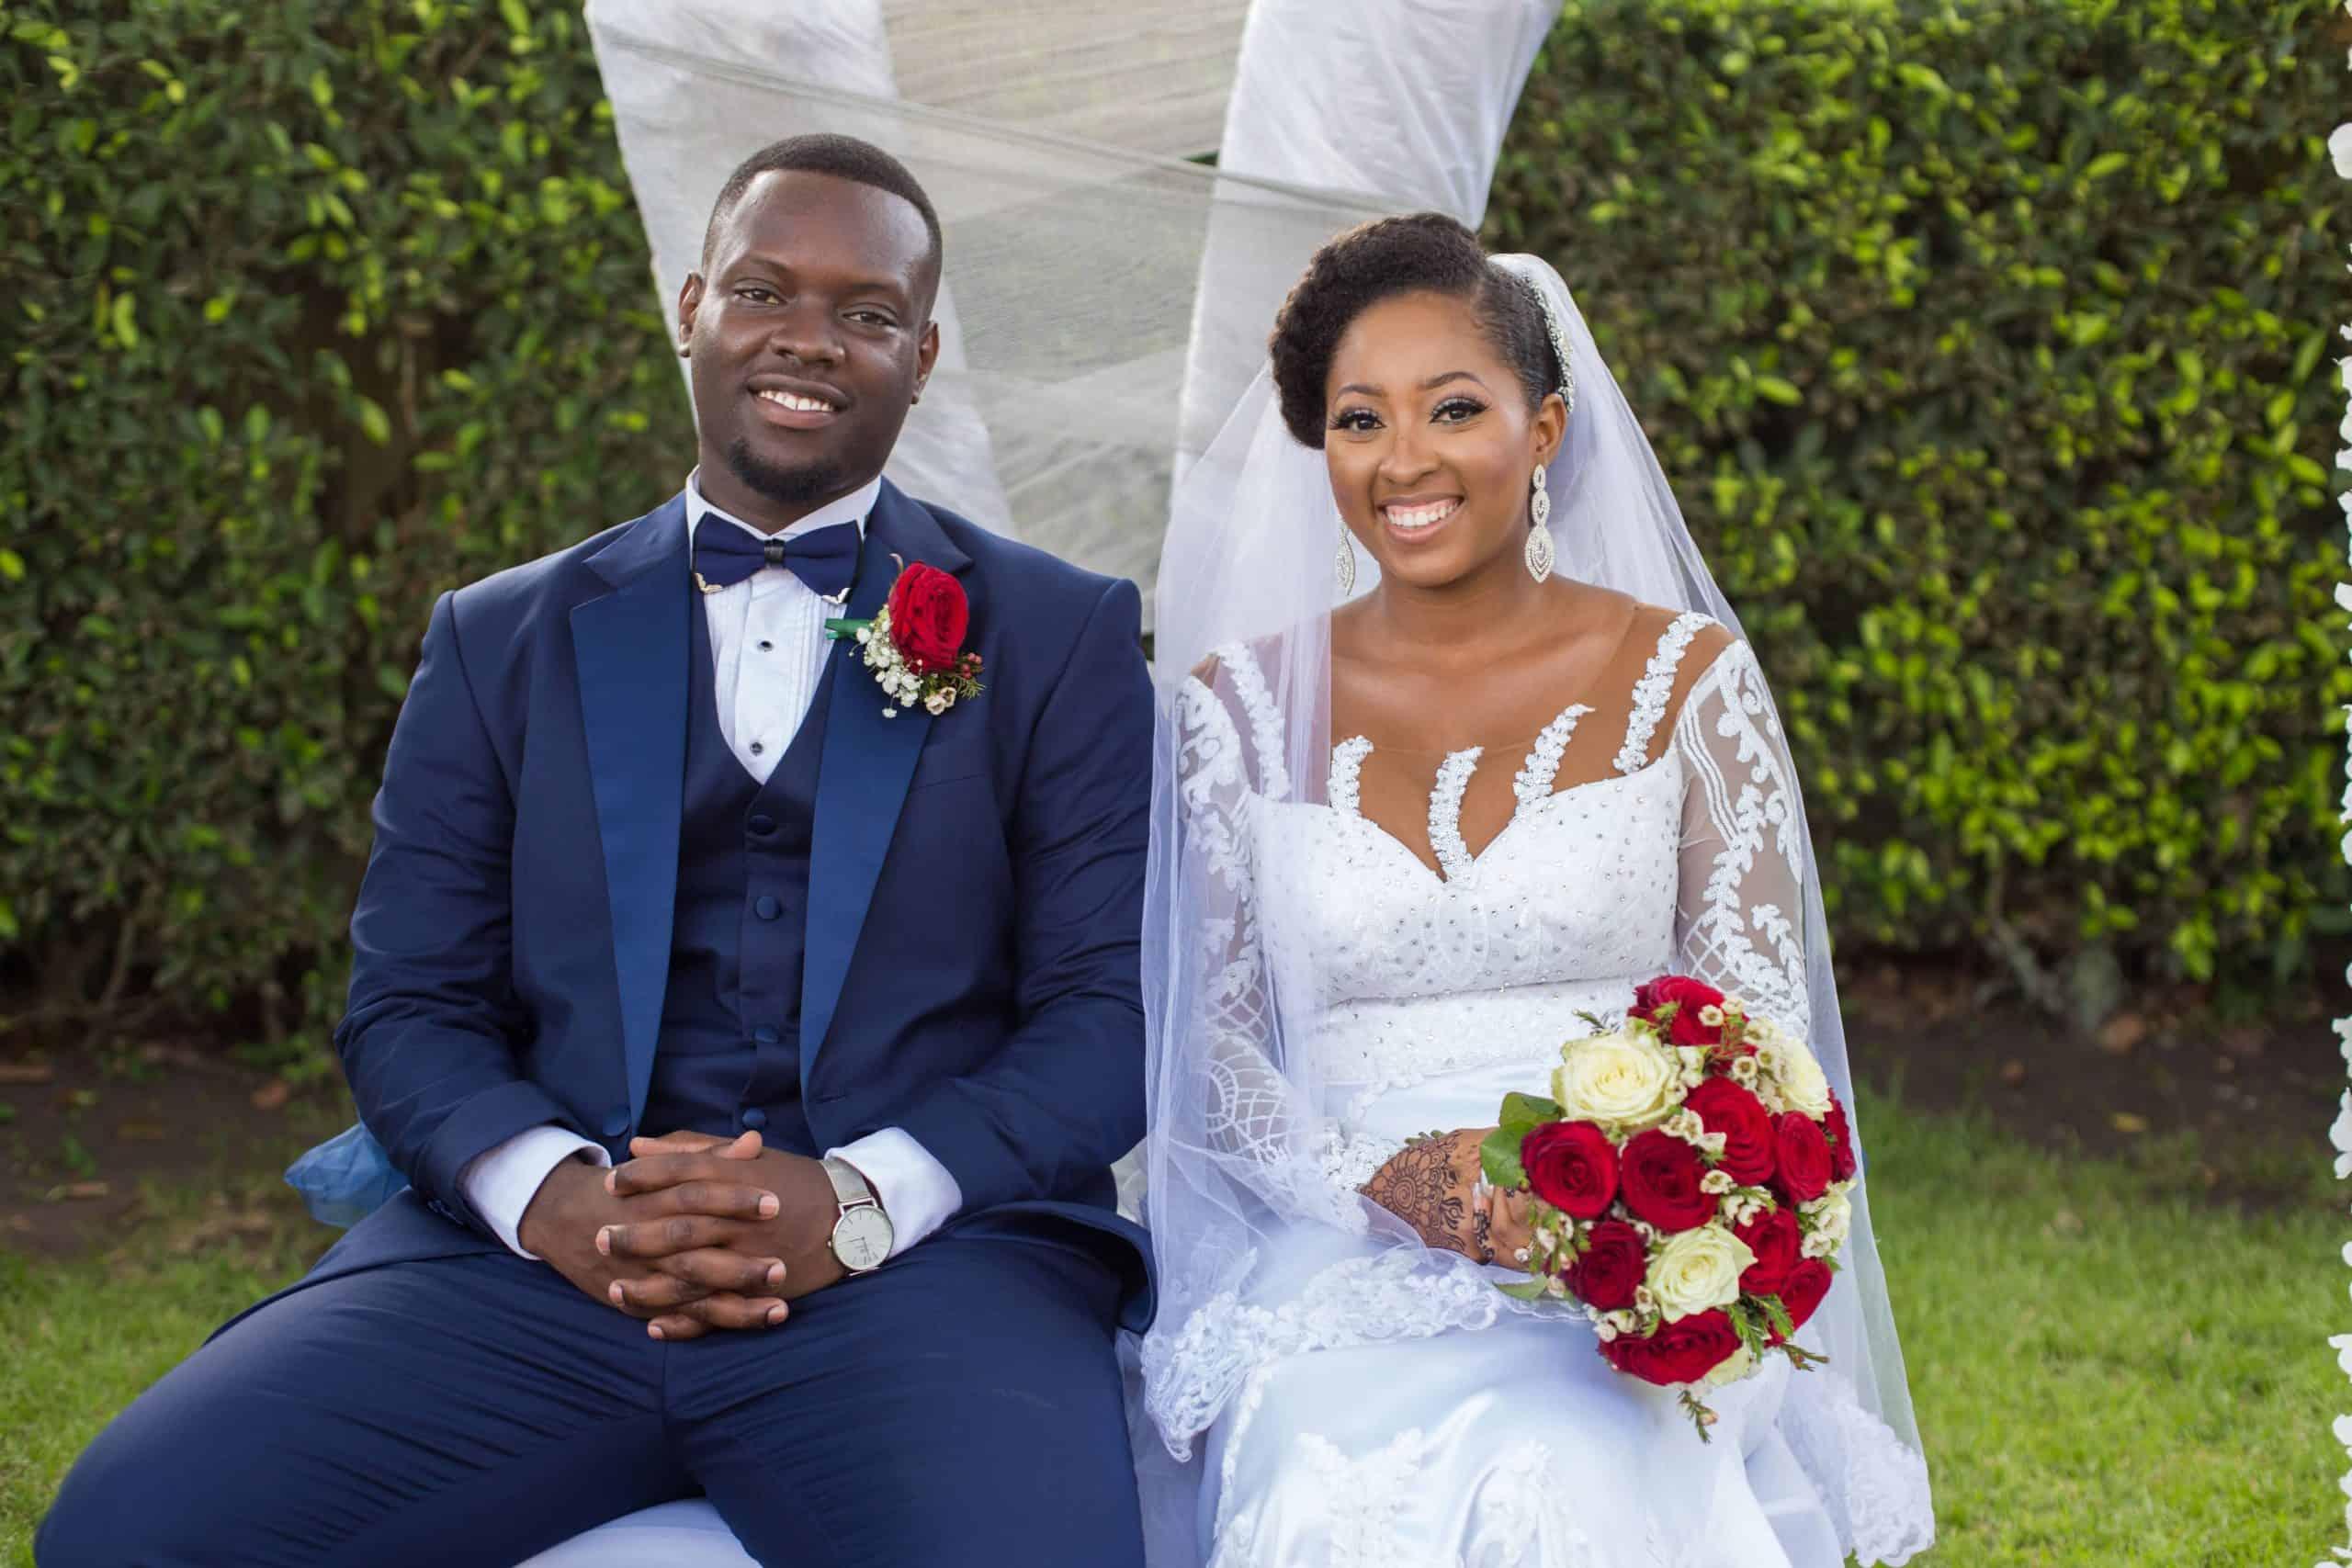 Mountain View Garden Wedding at Peduase in Ghana